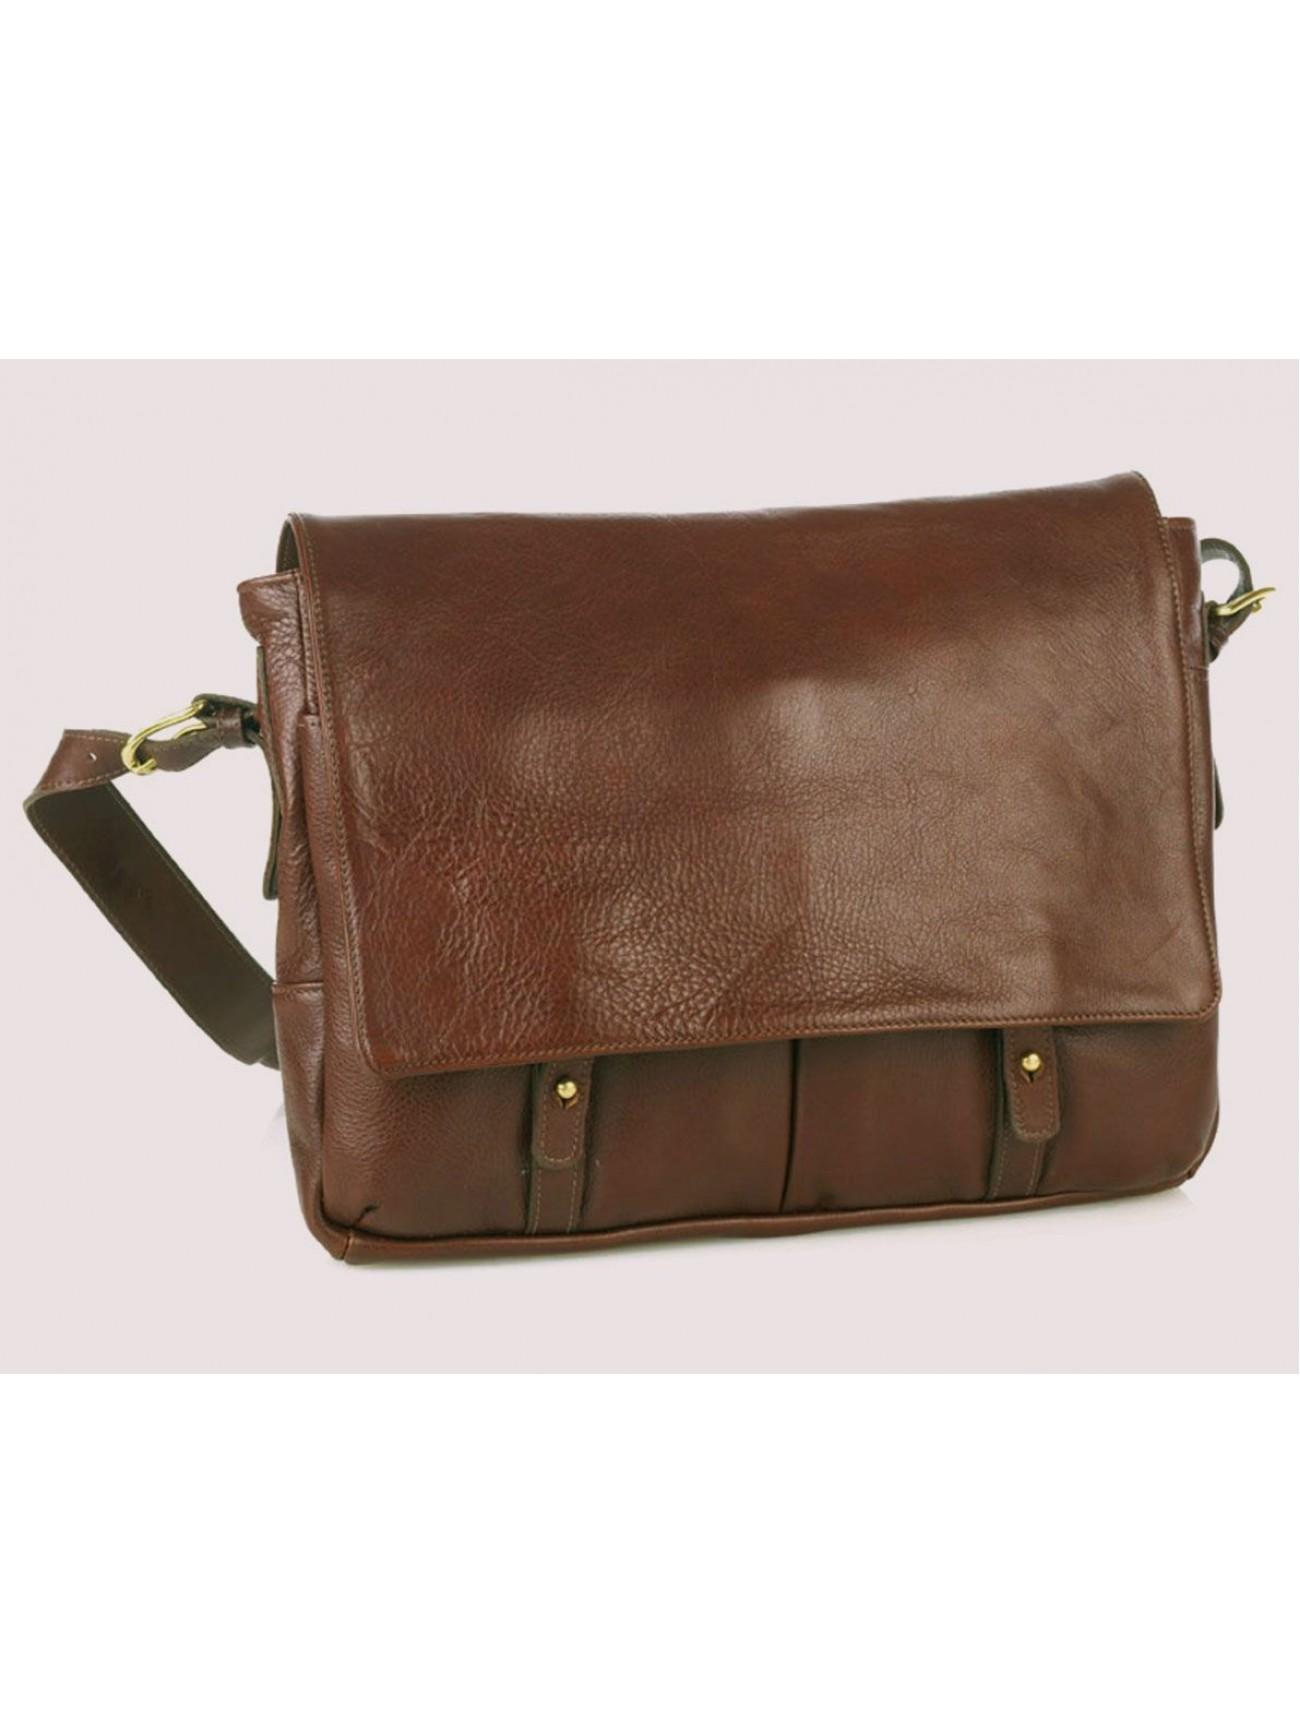 Rockland Medium Messenger Bag